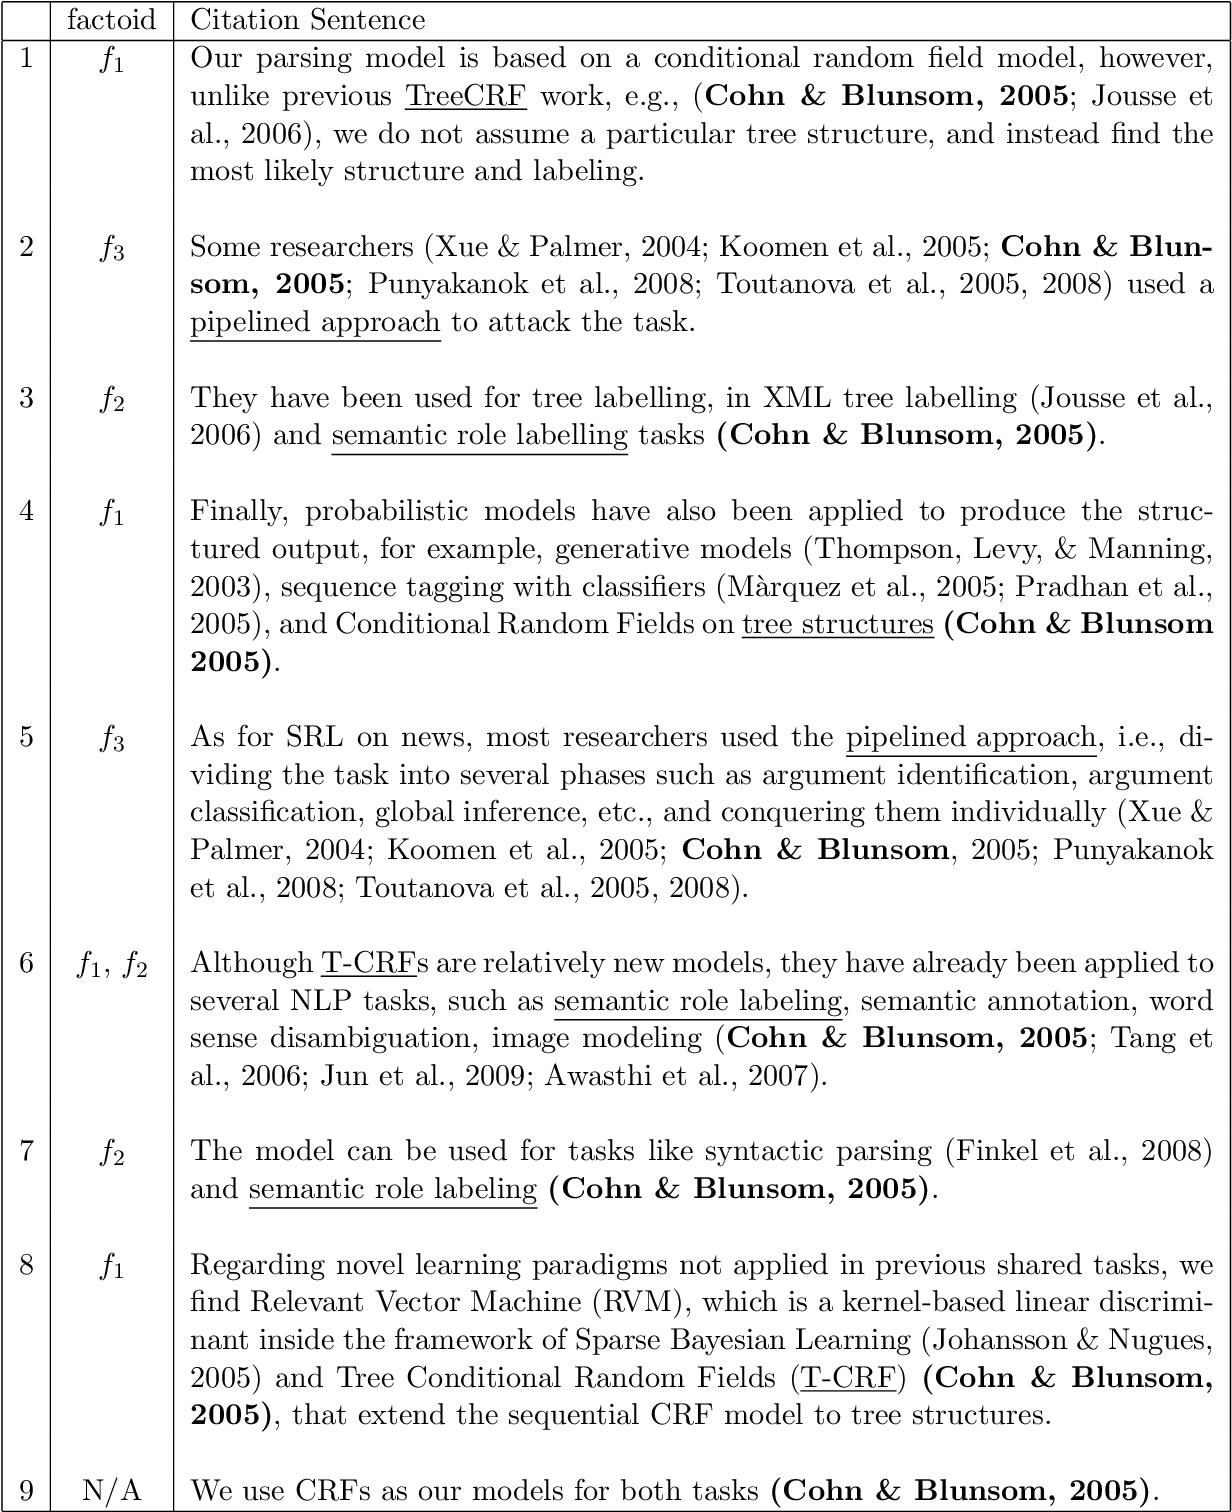 Figure 3 for Generating Extractive Summaries of Scientific Paradigms